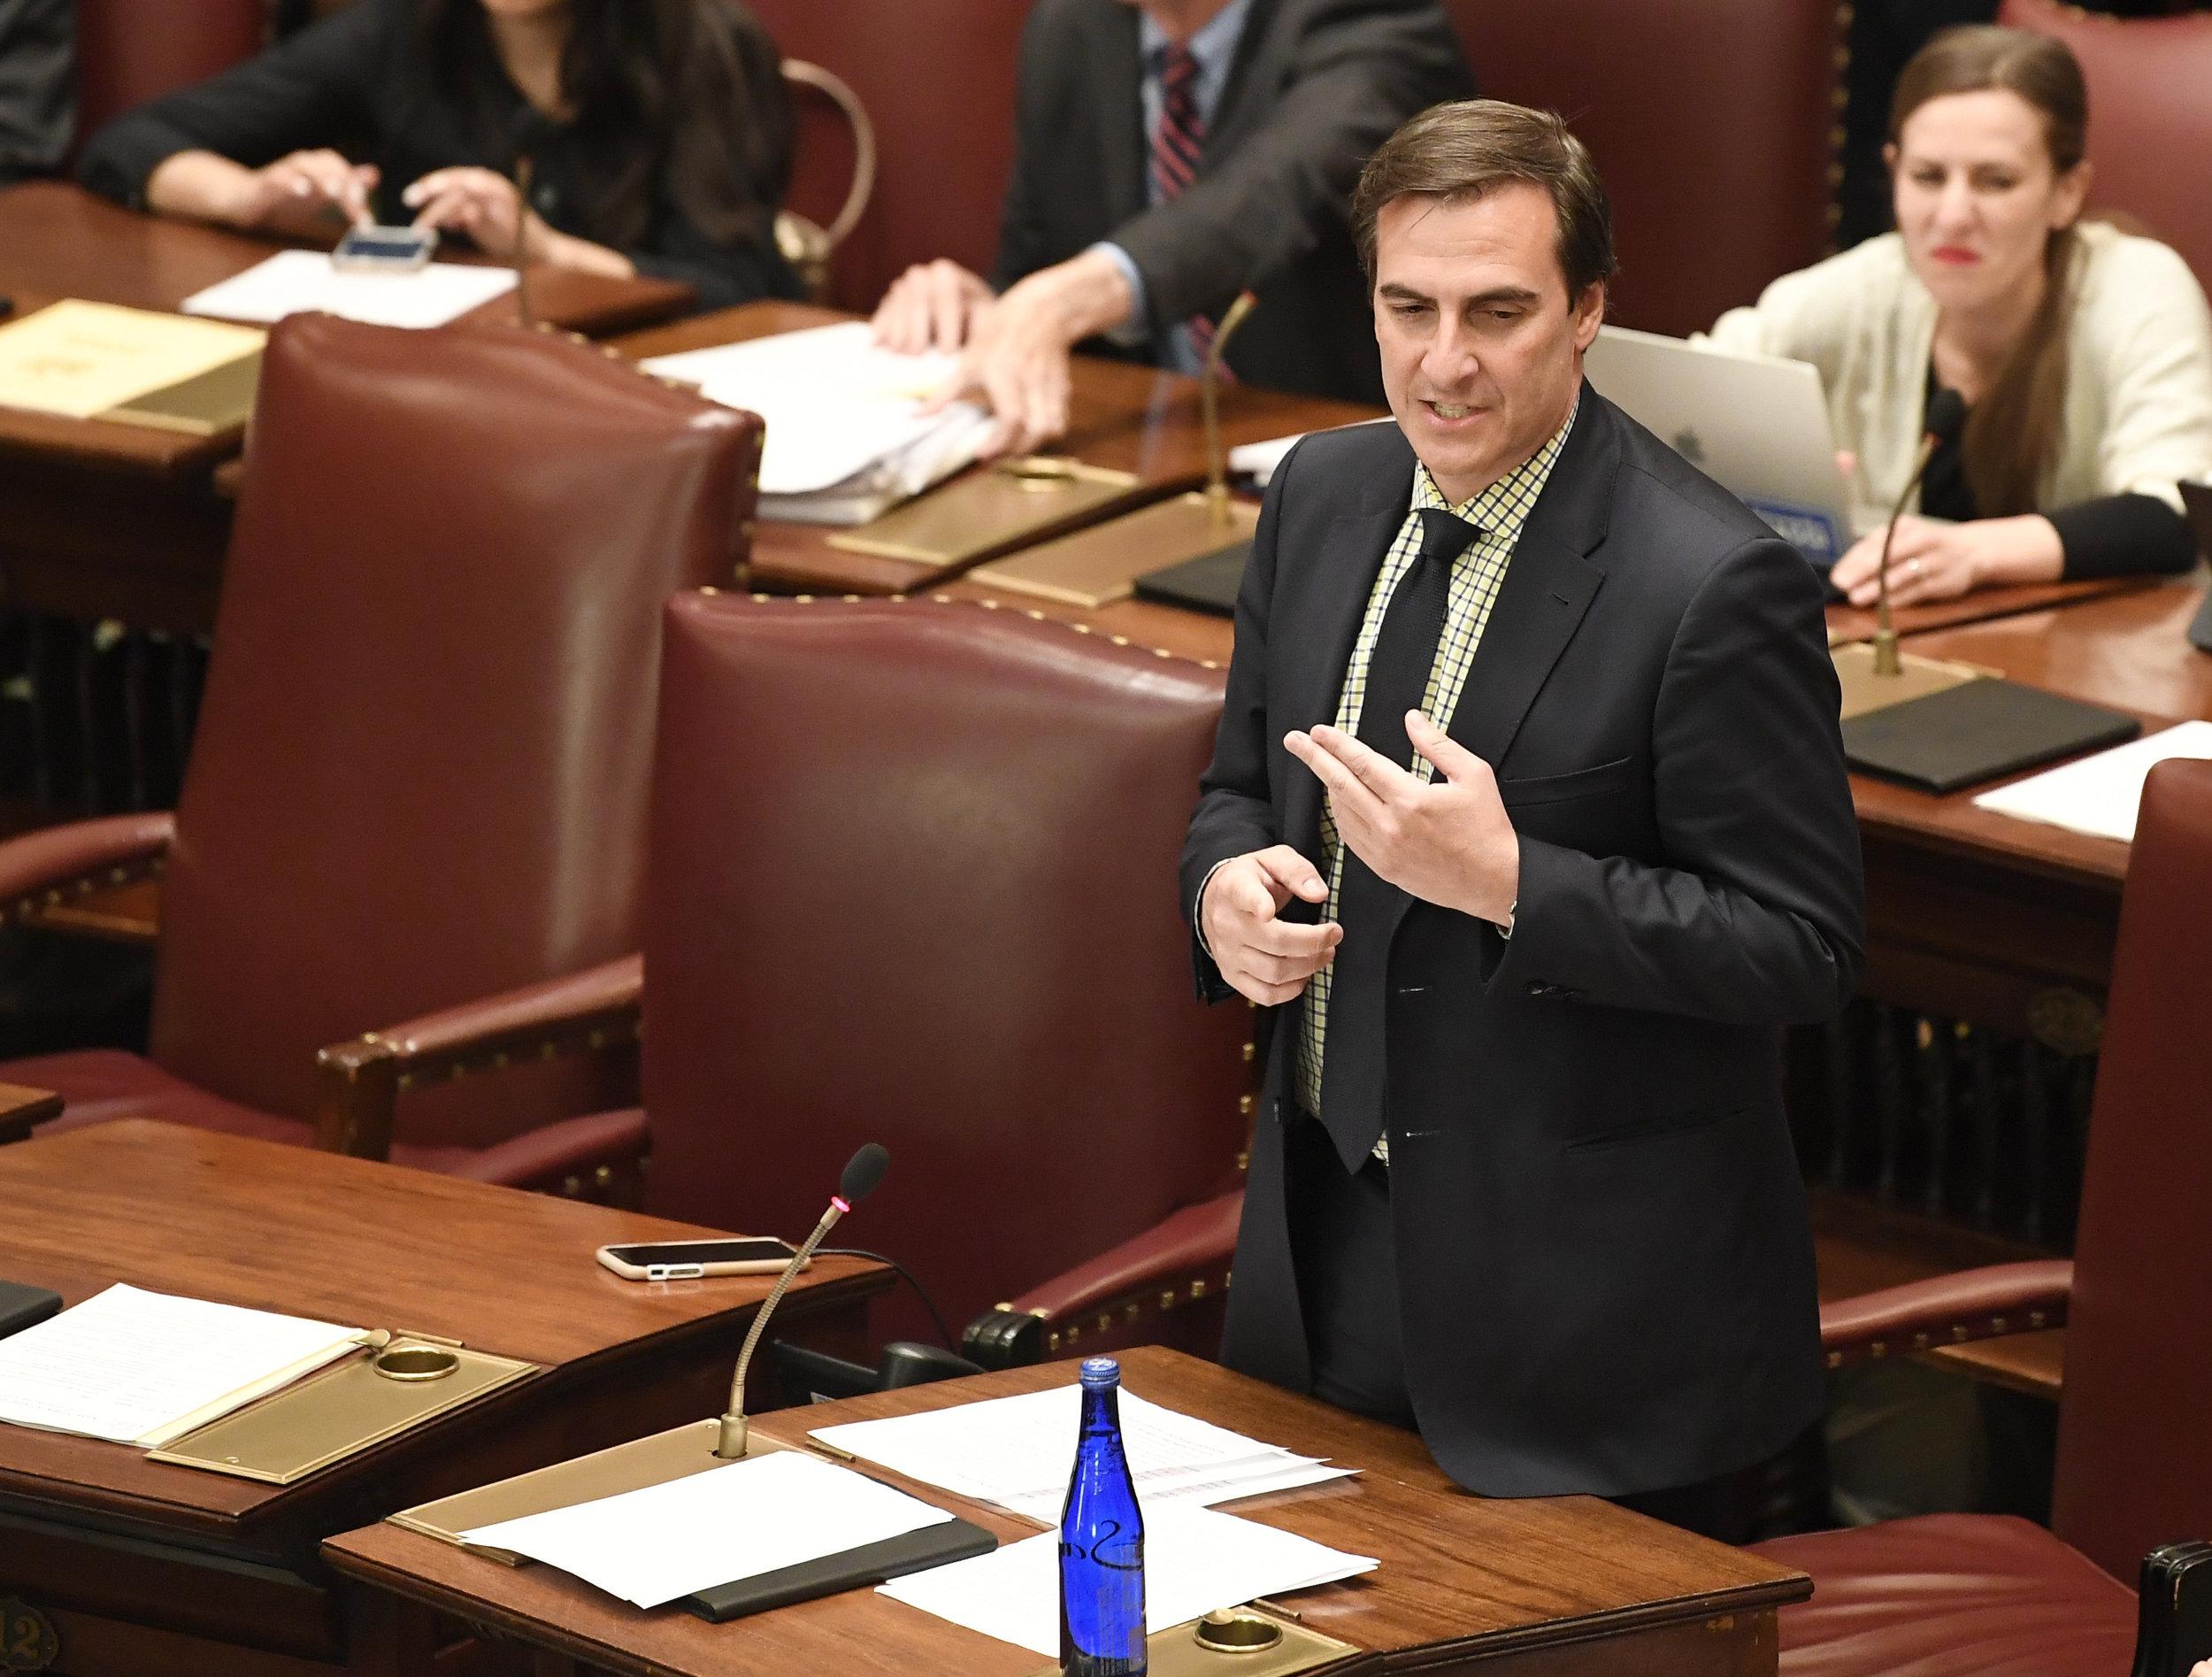 State Sen. Michael Gianaris sponsored the bill to establish automatic voter registration in New York. AP Photo/Hans Pennink.